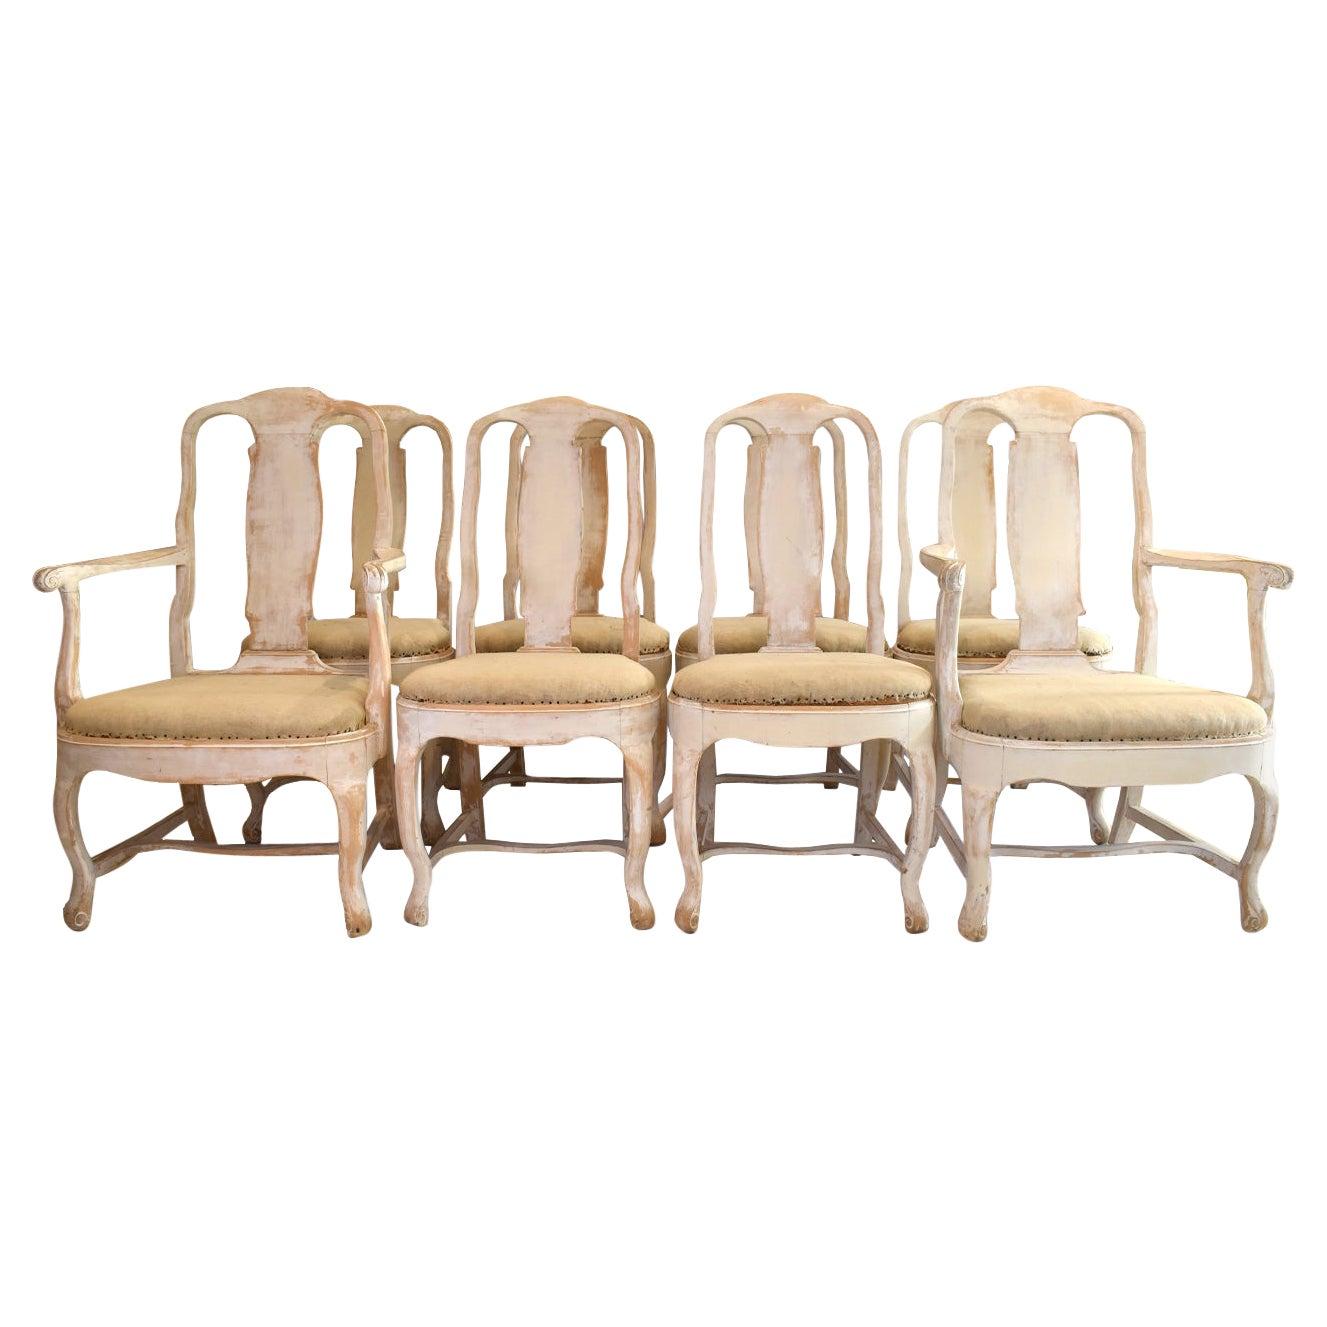 19th Century Swedish Rococo Chairs - Set of 8